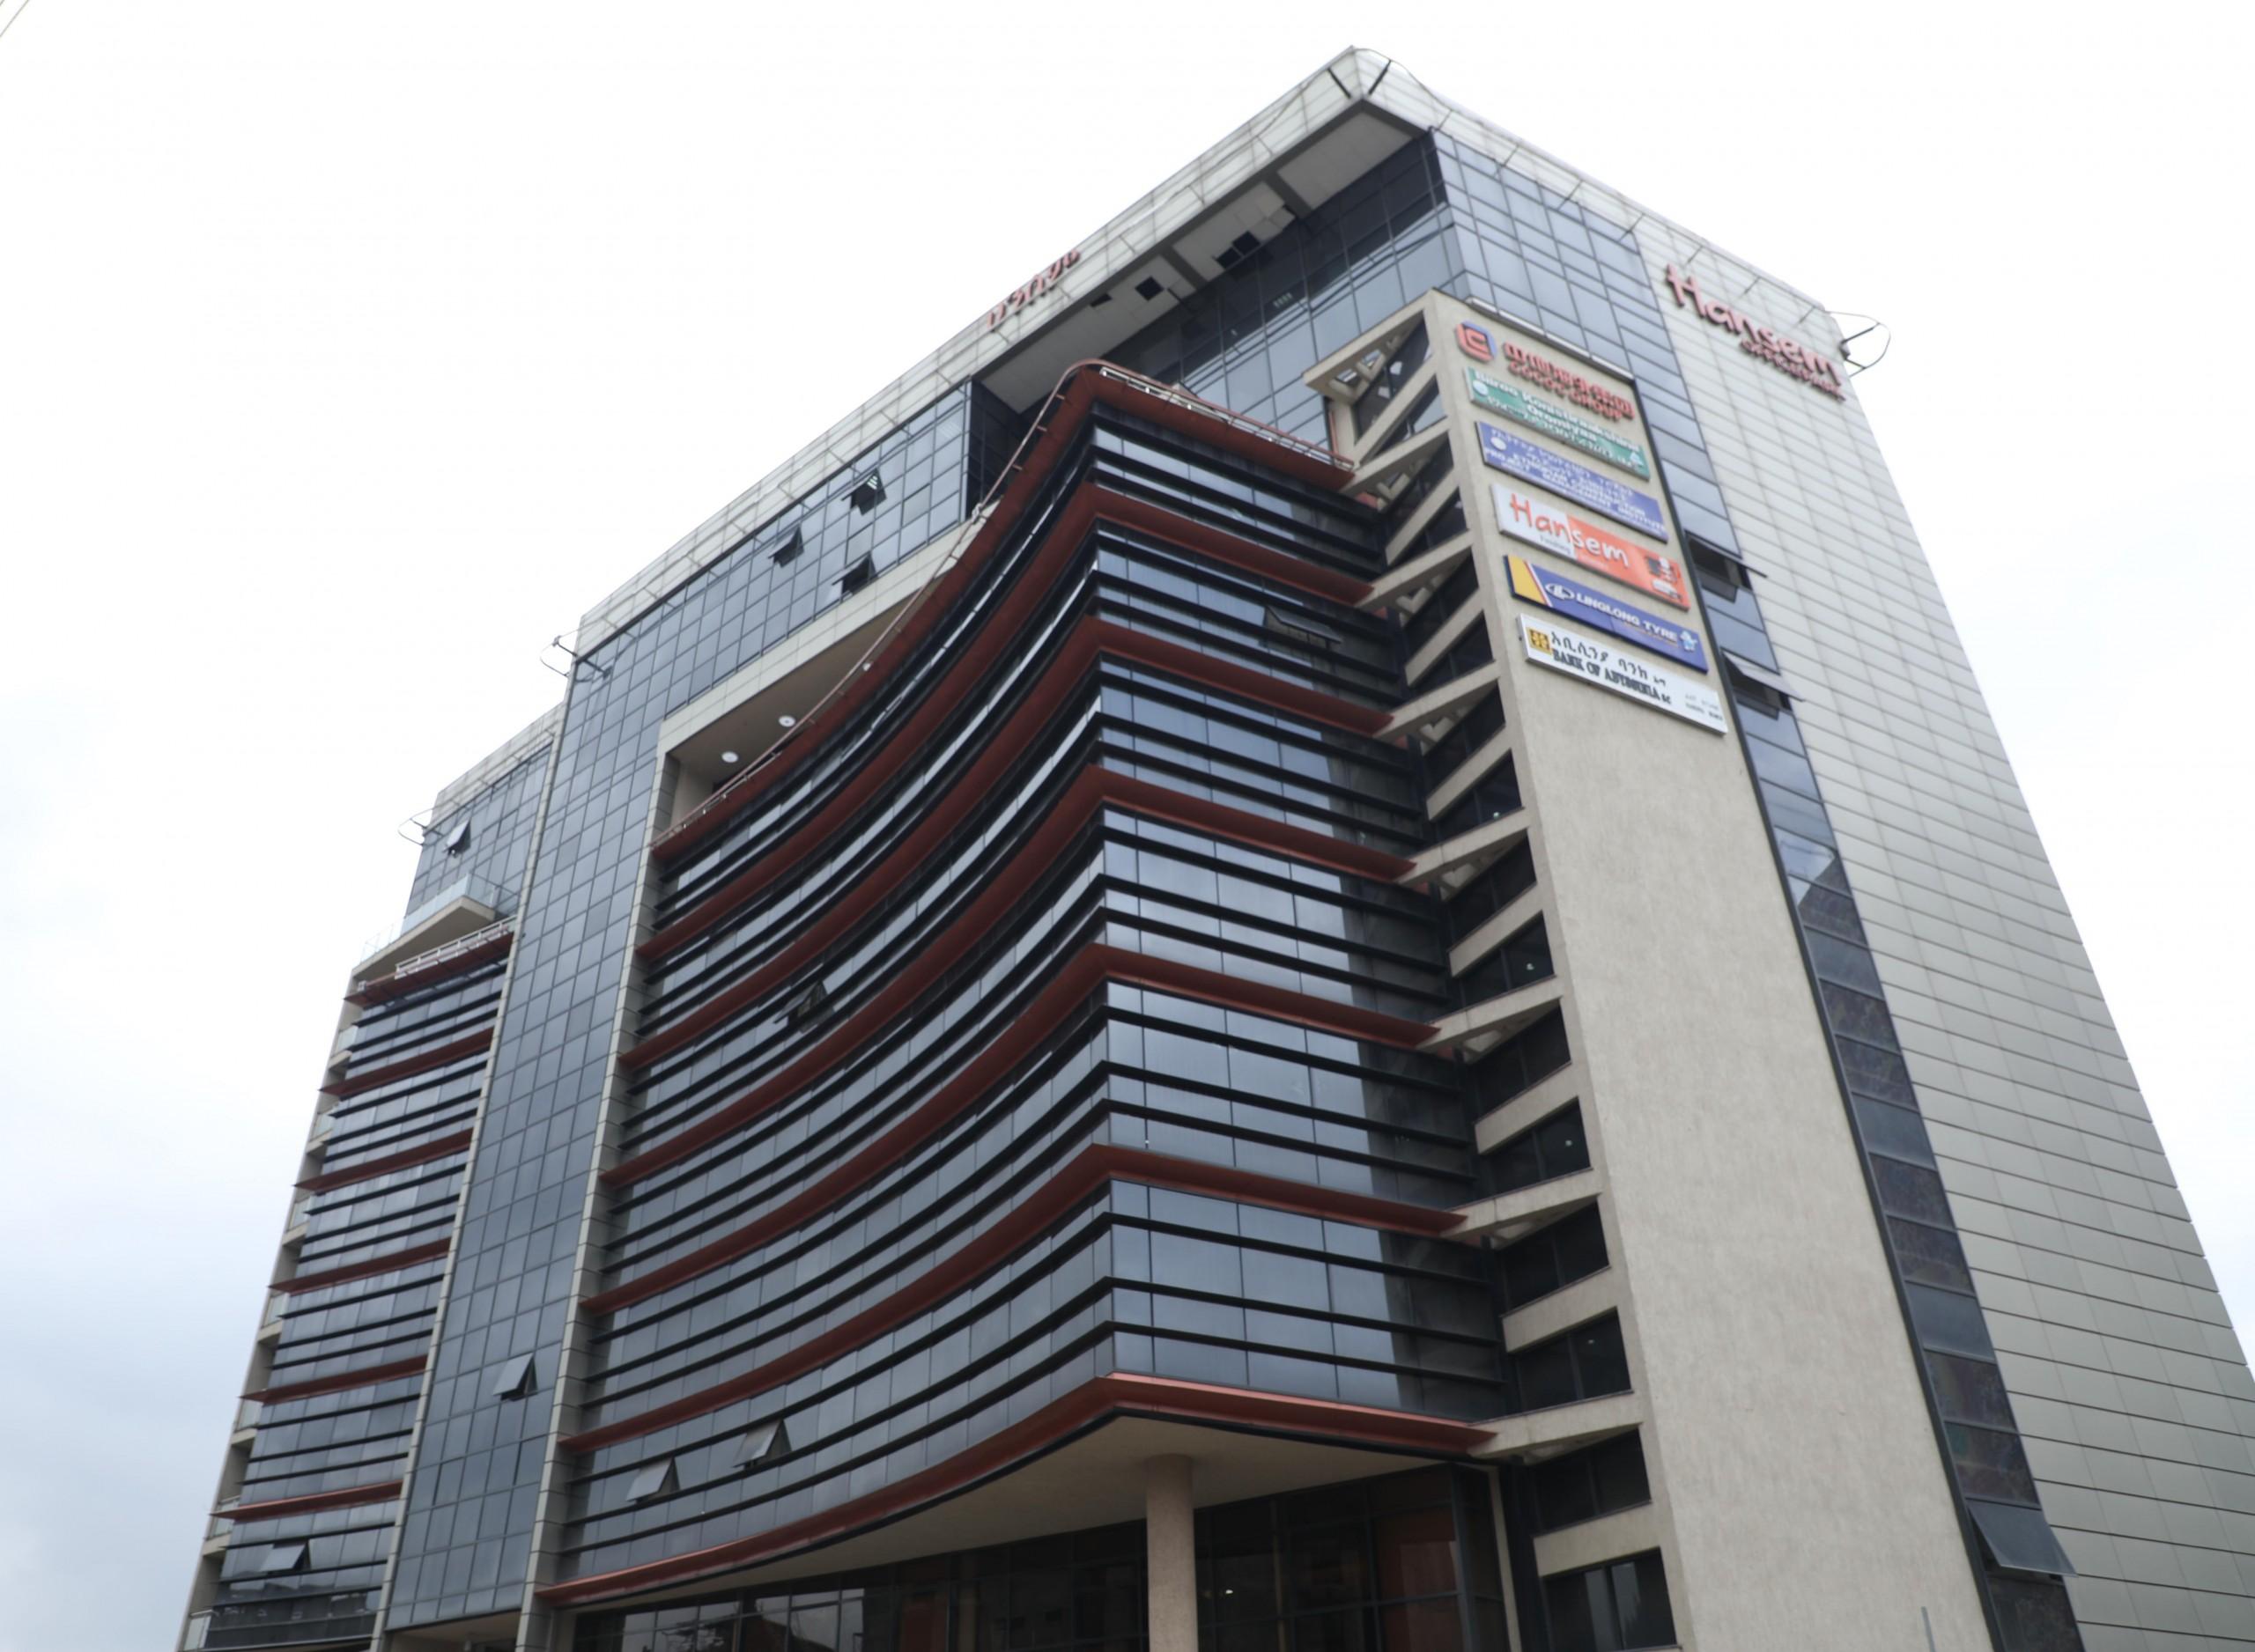 1J2A8565 scaled - Hansem Office Park